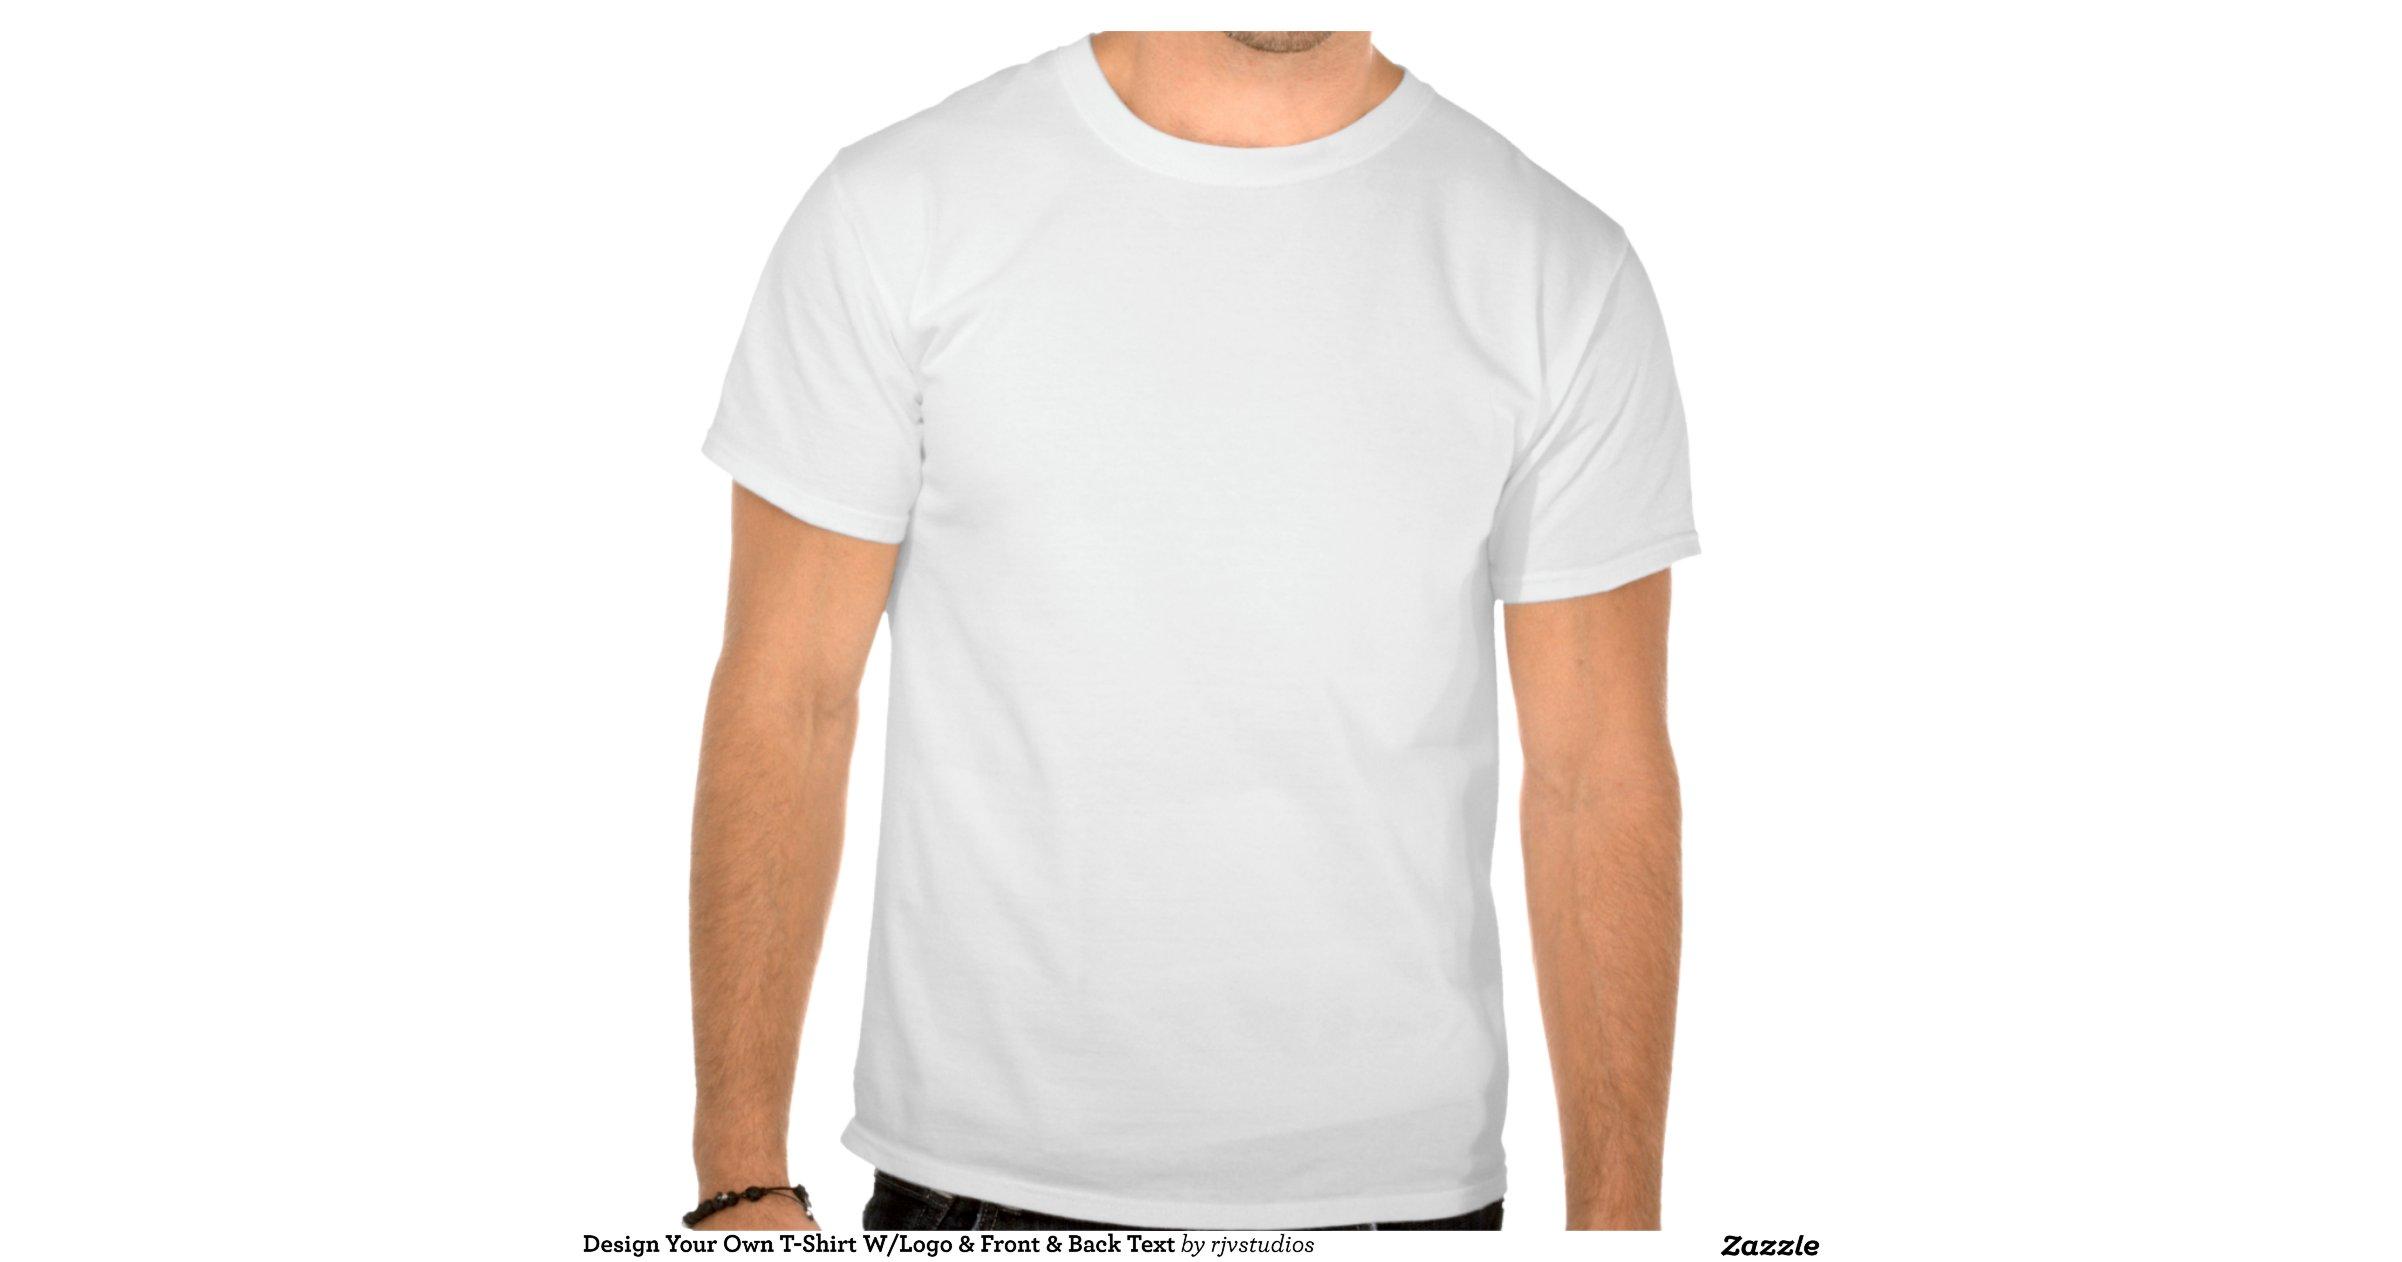 Design your own t shirt zazzle - Top Logo Design Design Your Own Logo For T Shirts Design_your_own_t_shirt_w_logo_front_back_text